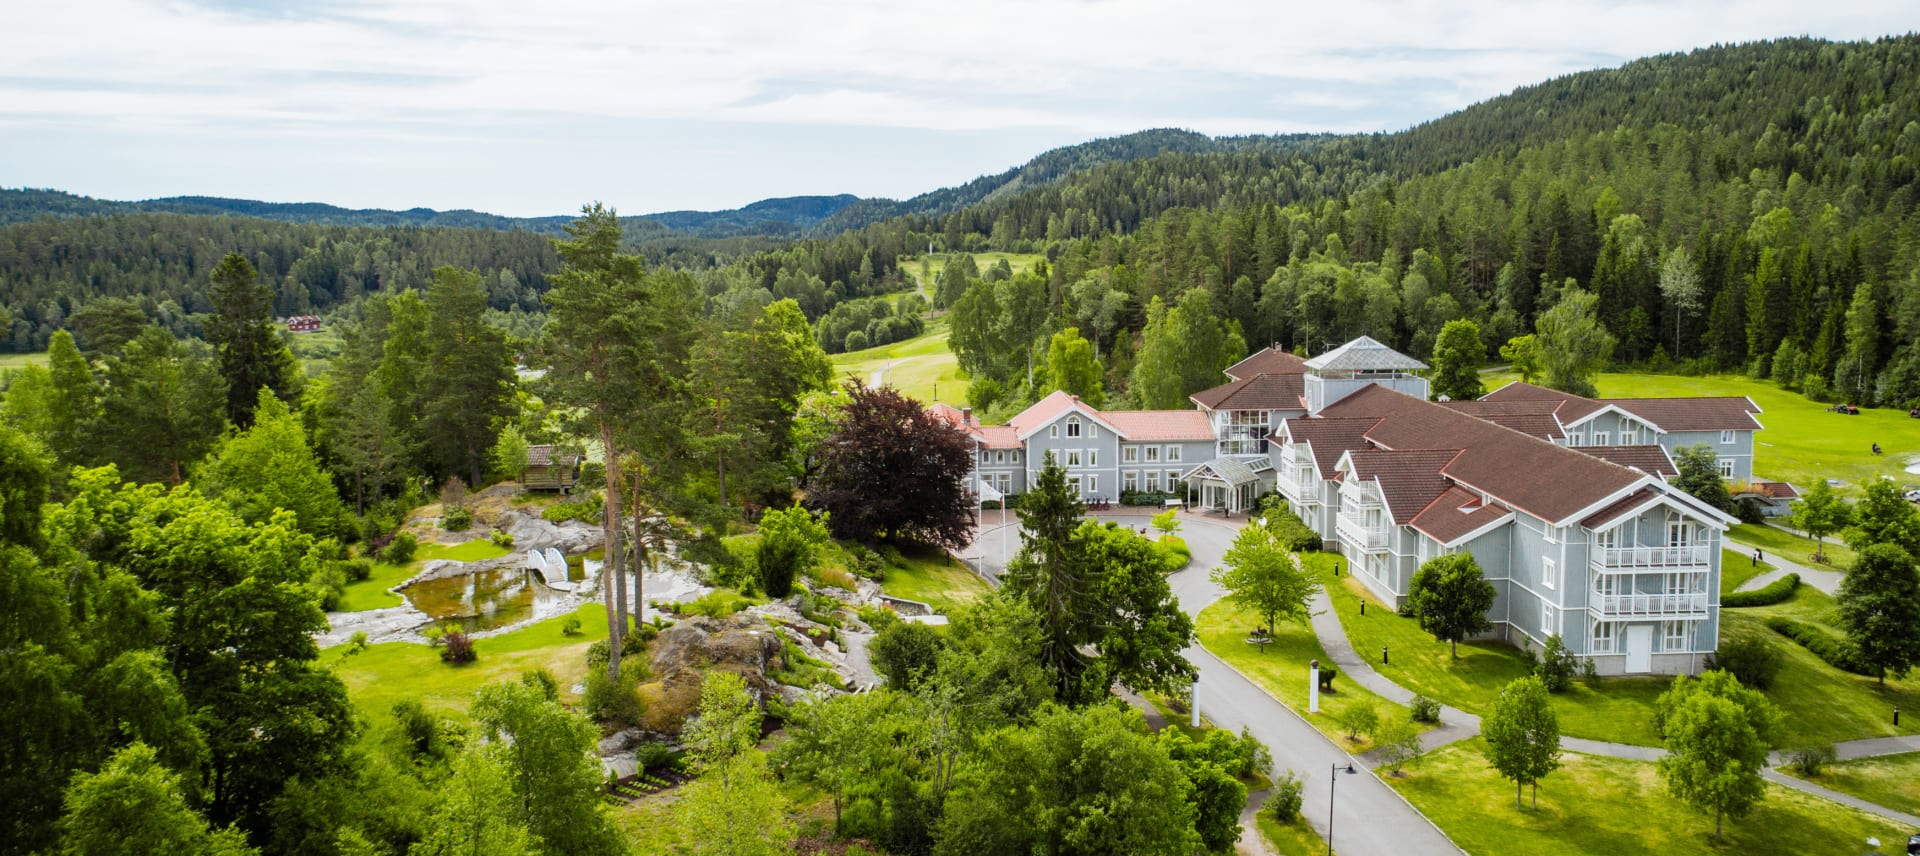 Hotell, konferanse og 18-hullsgolfbane